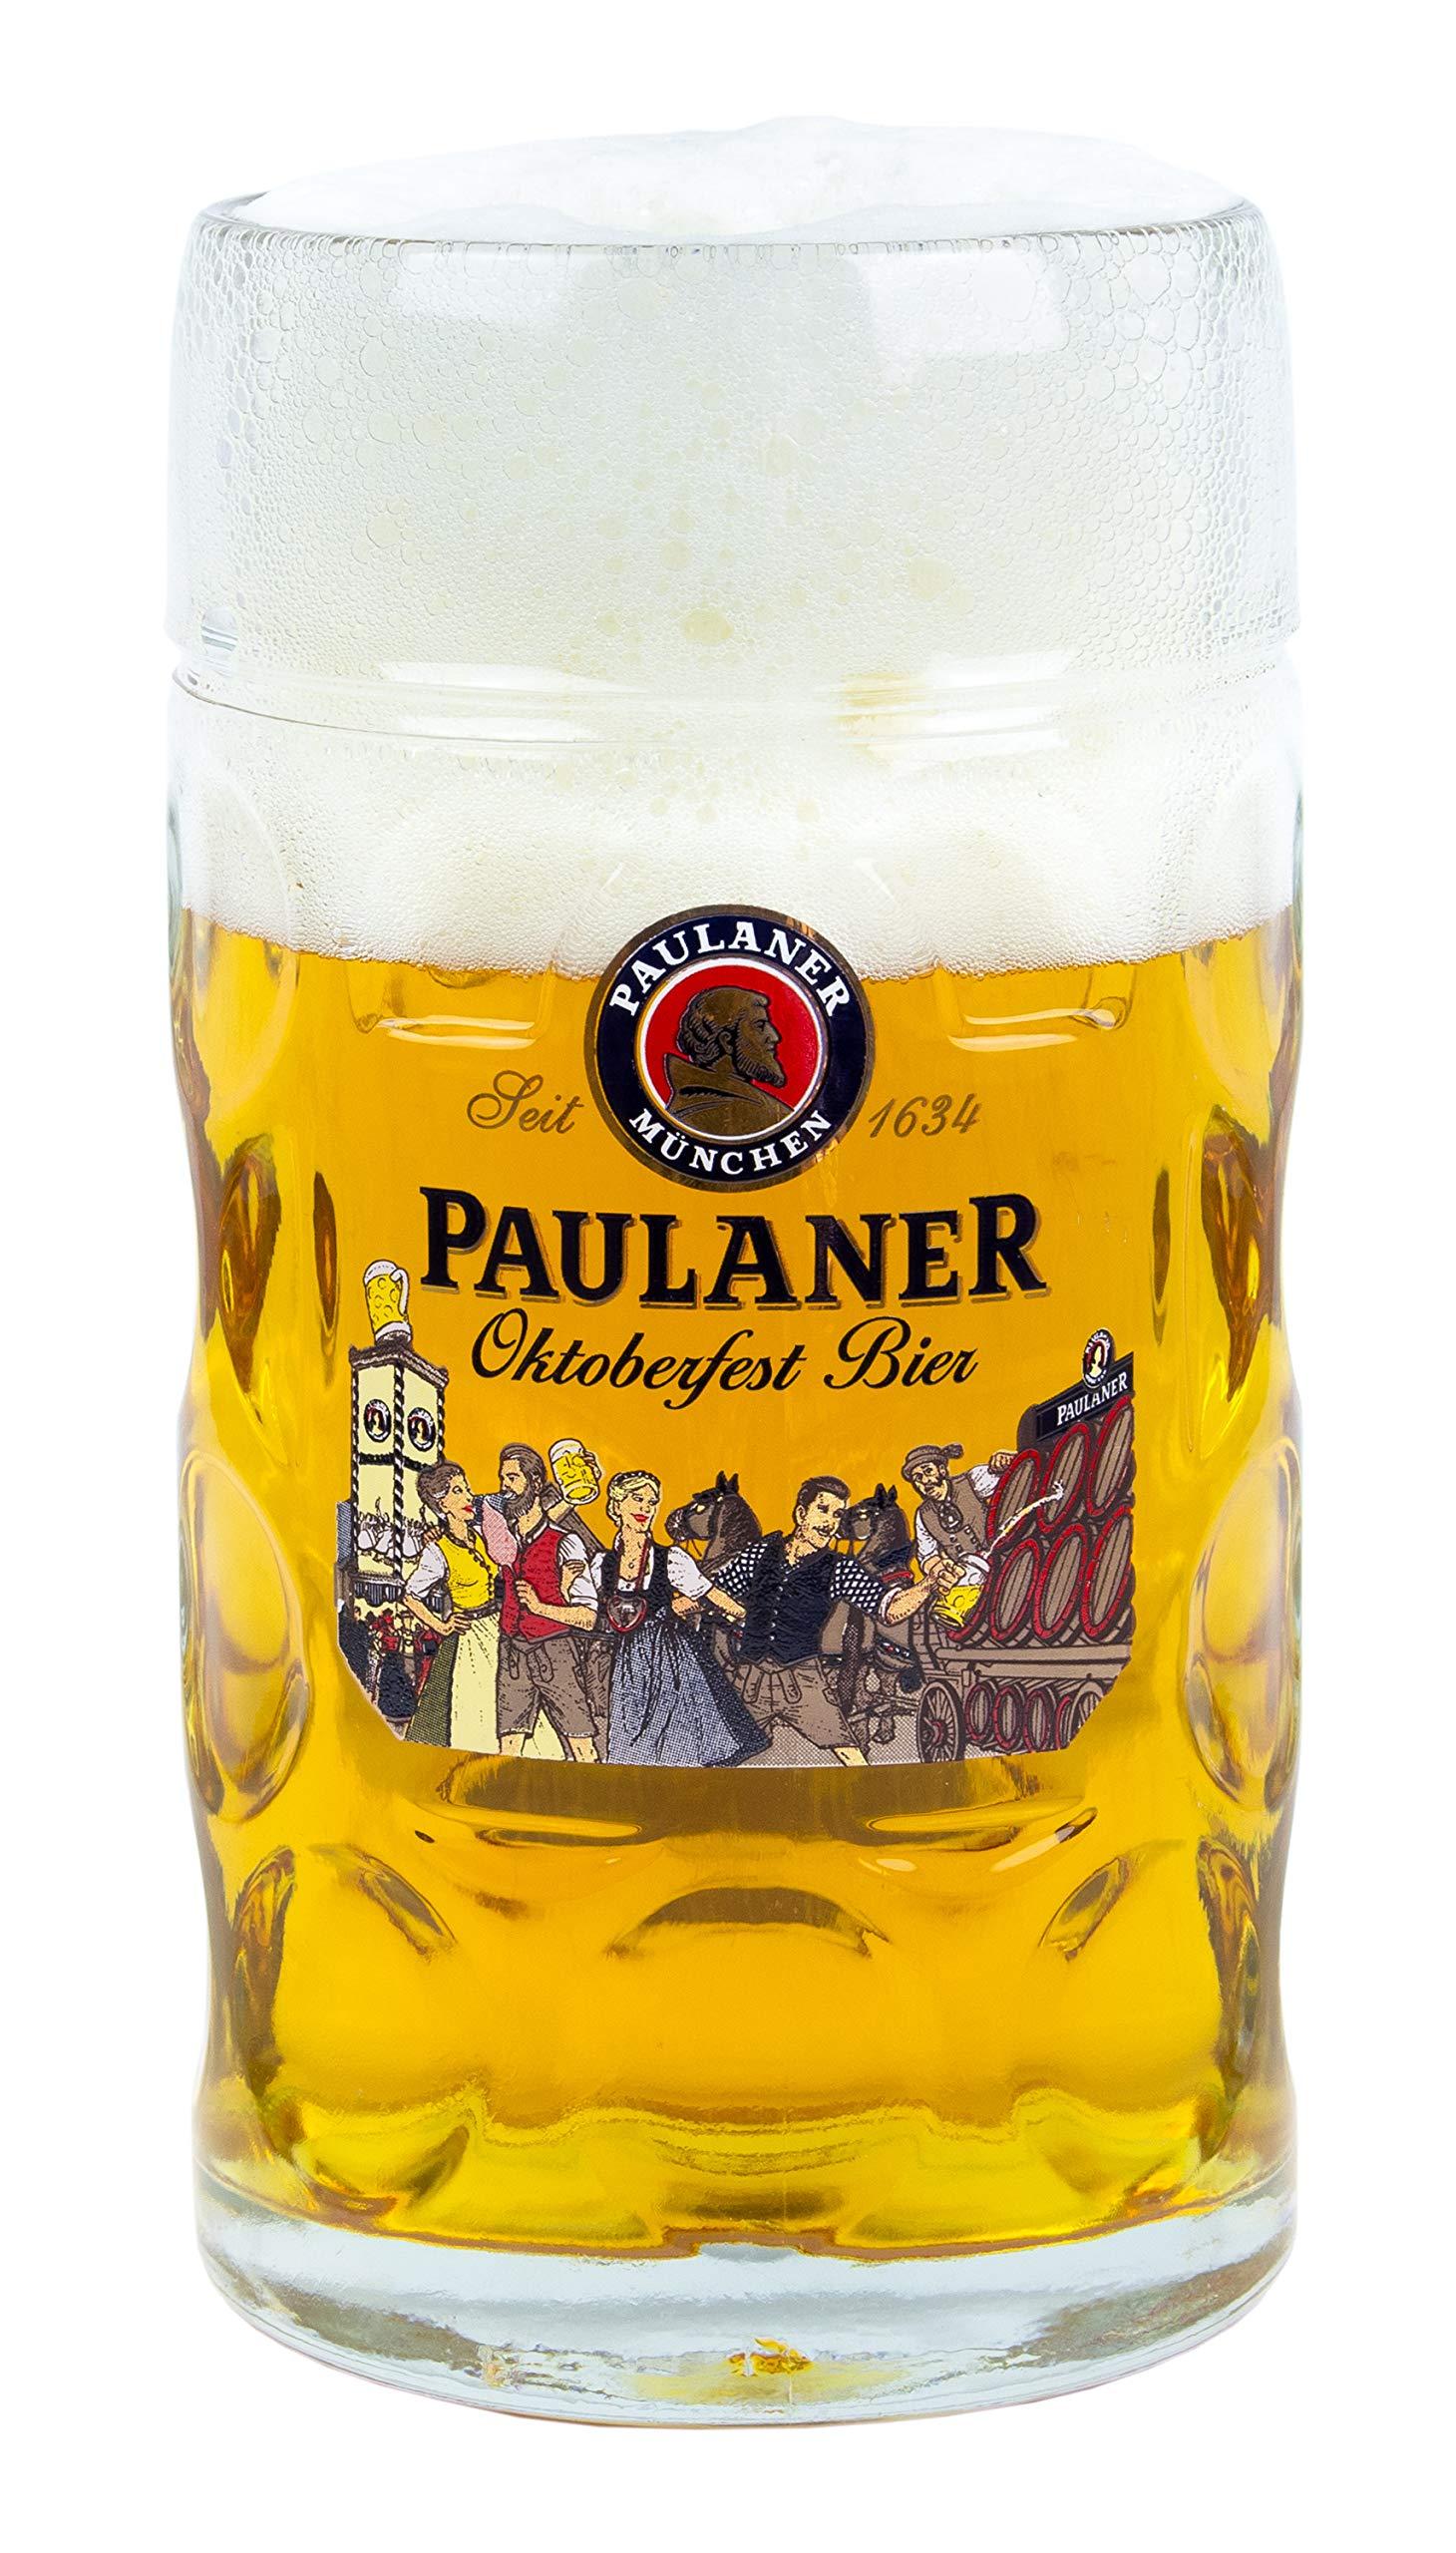 Paulaner Dimpled Isar Beer Mug - 1 Liter Mass Krug (Oktoberfest 'Wiesn' Edition)